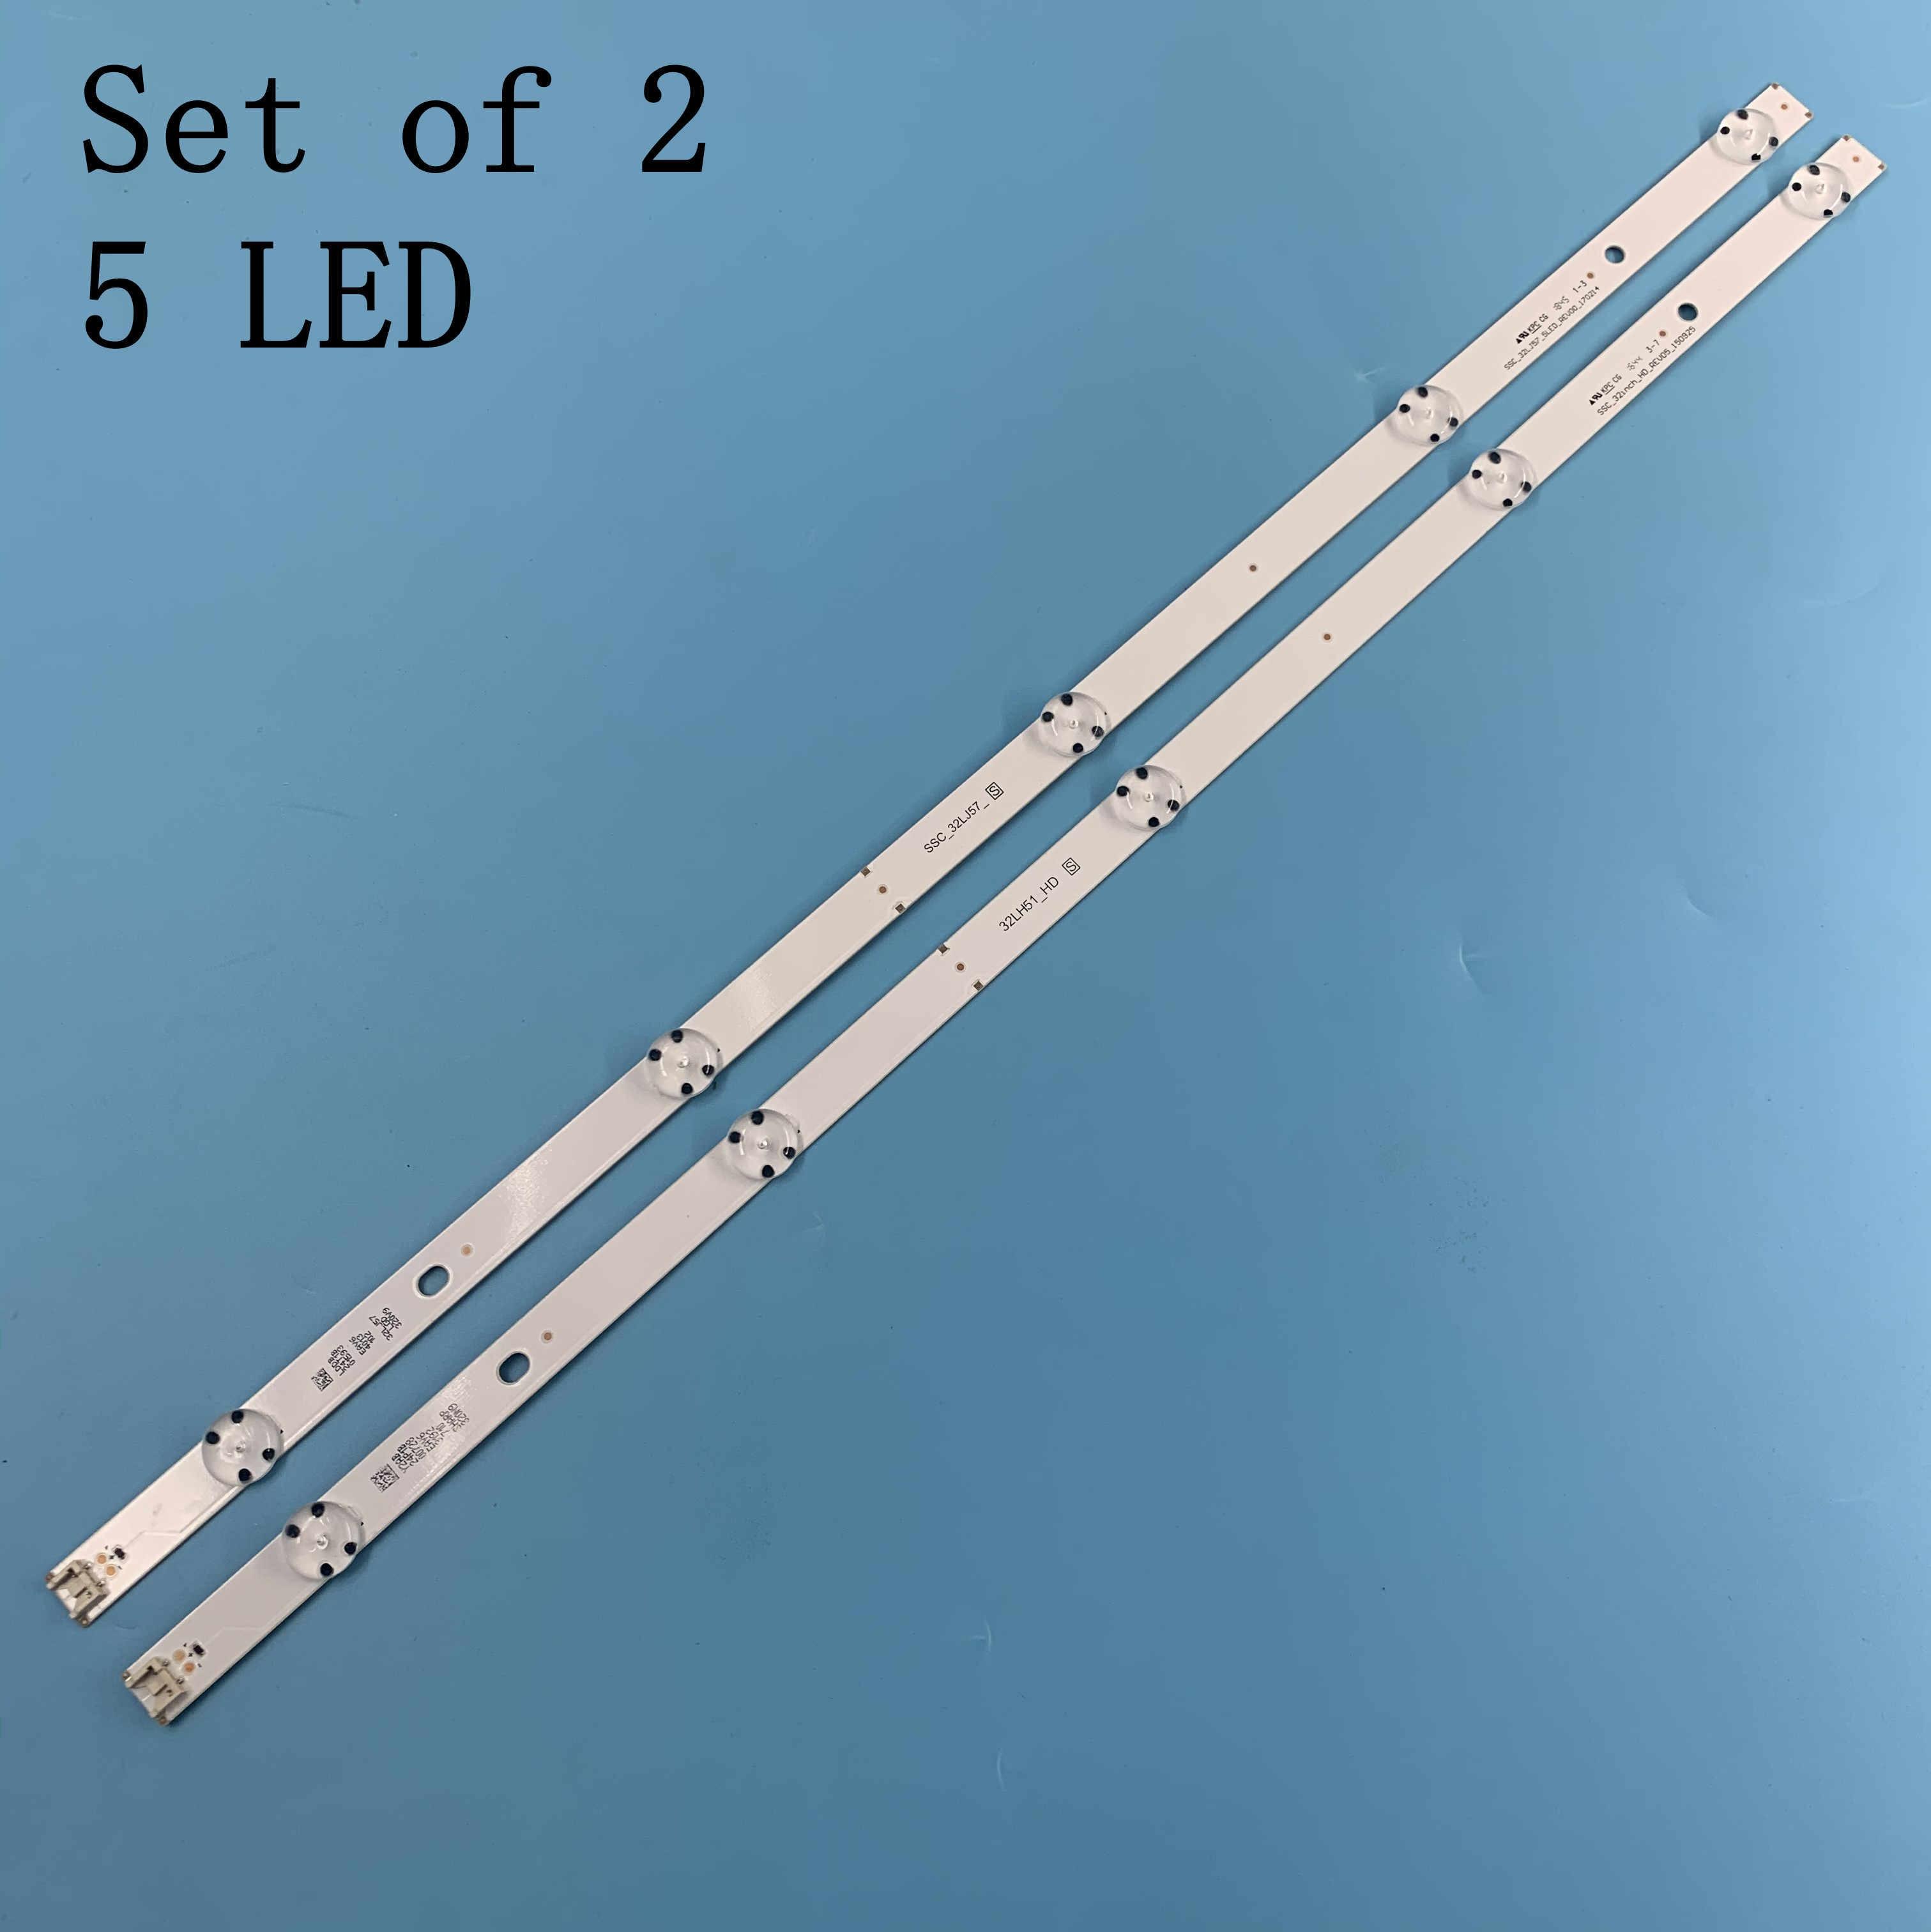 2pcs LED רצועת SSC_32inch_HD_REV05_150925 32LH51_HD עבור LG 32LF510U 32LH570B 32LH51_HD 32LF510U 32LH590U 32LH570B